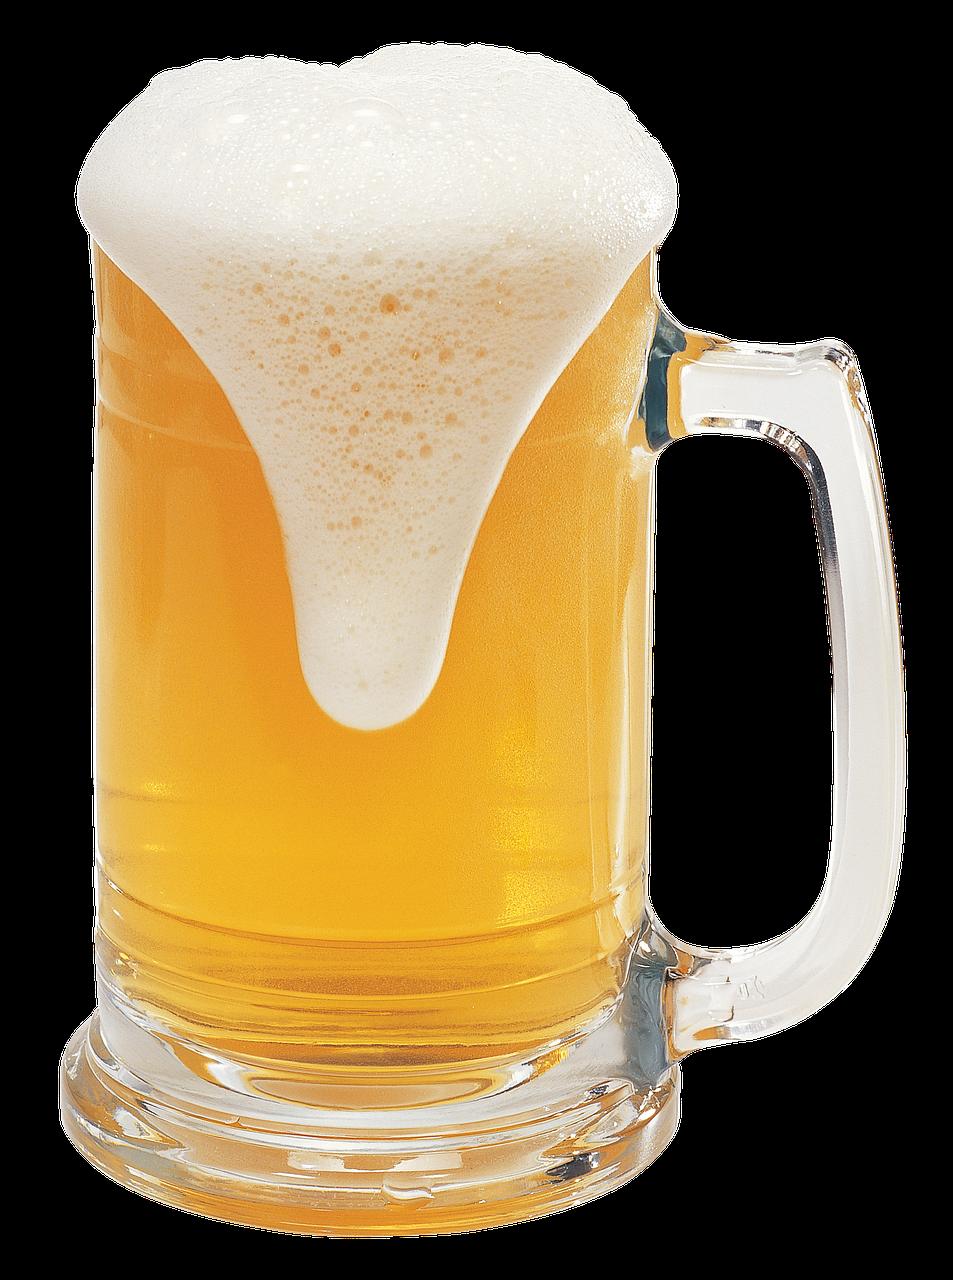 beer-1538754_1280.png